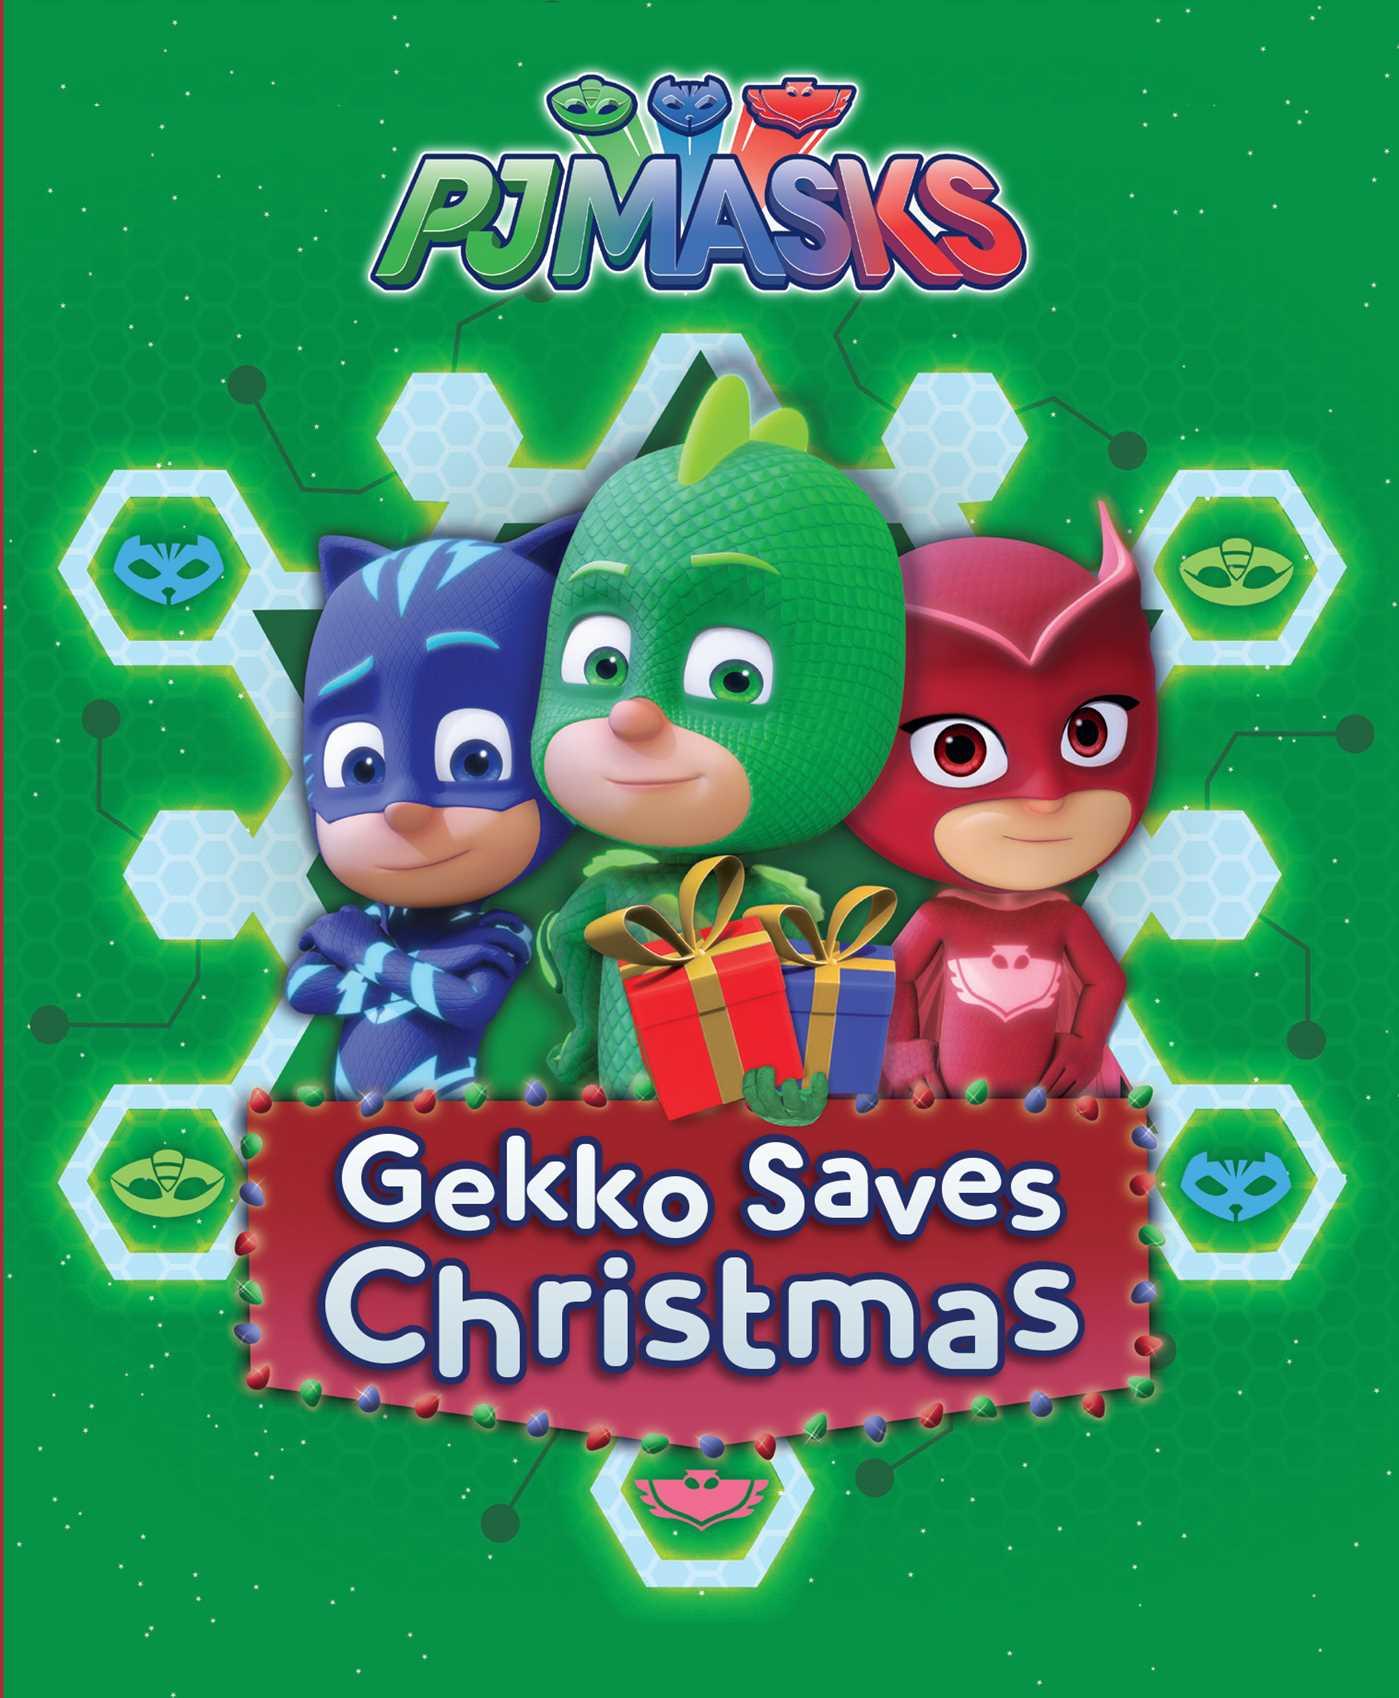 Gekko saves christmas 9781534428850 hr